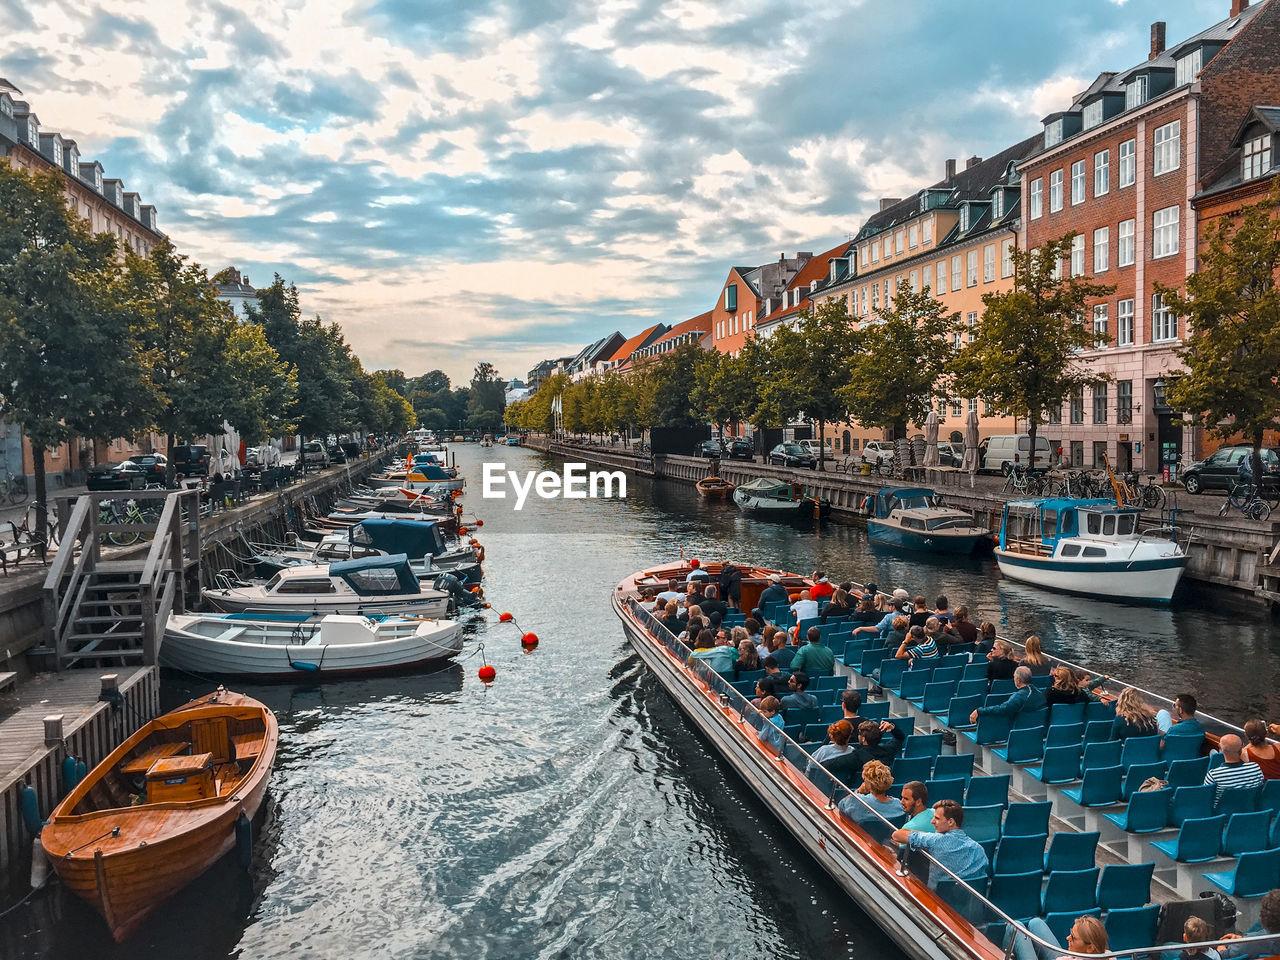 View Of Boats In Copenhagen City River